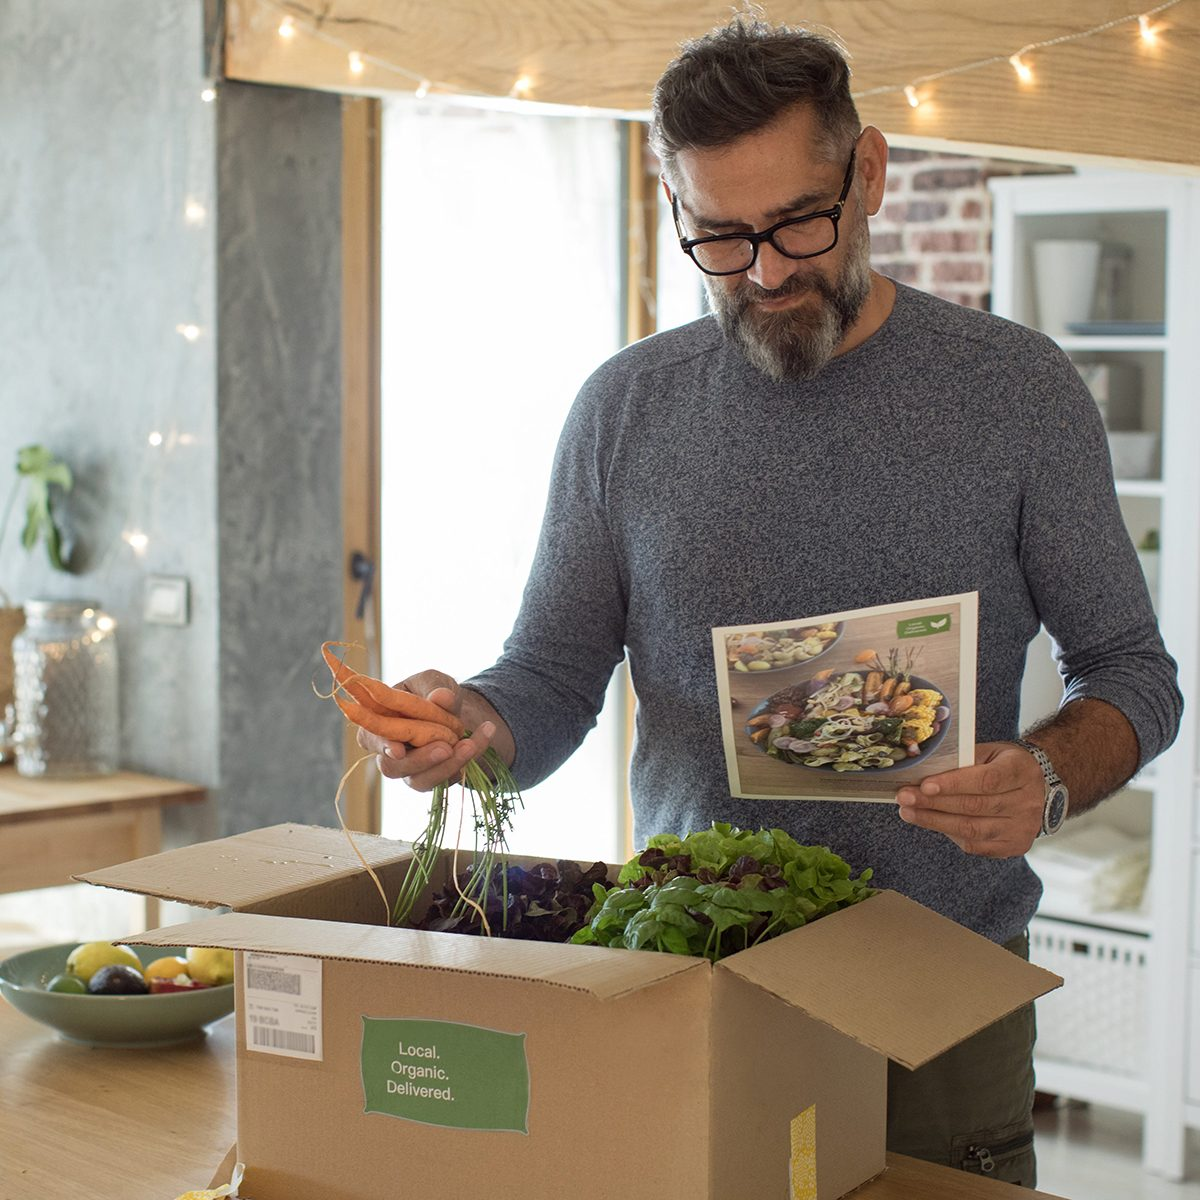 Man opening meal prep box